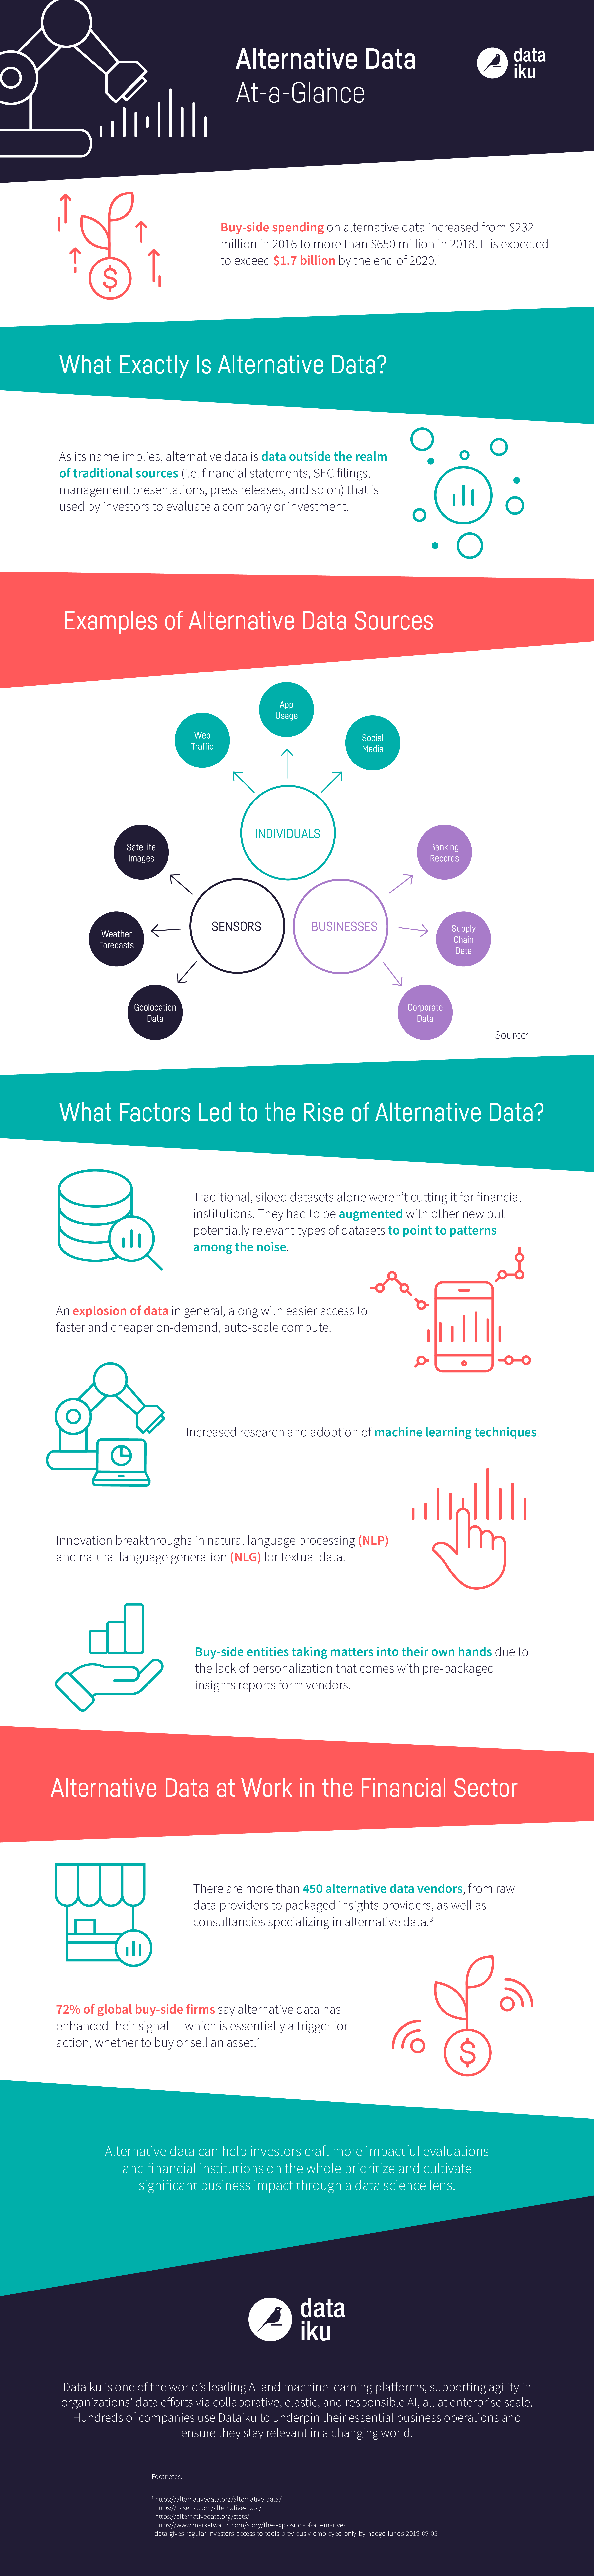 Alternative Data for Financial Markets